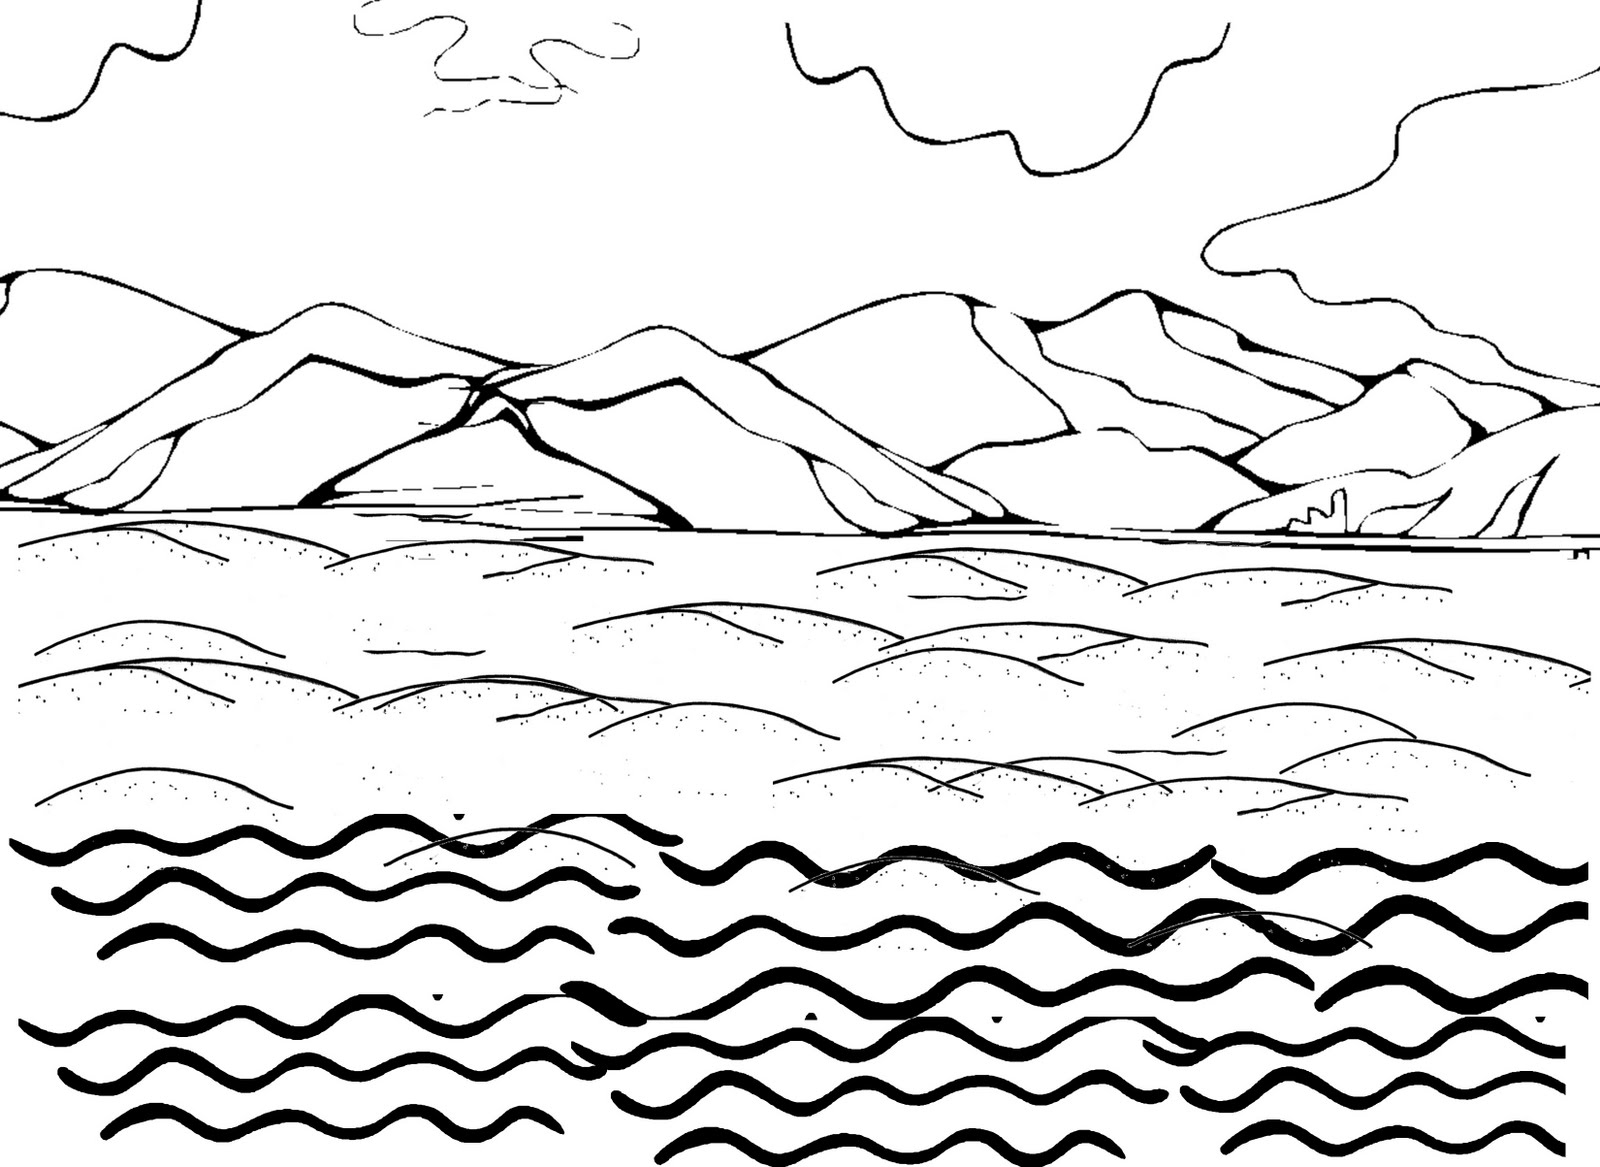 Water Waves Drawing At Getdrawings